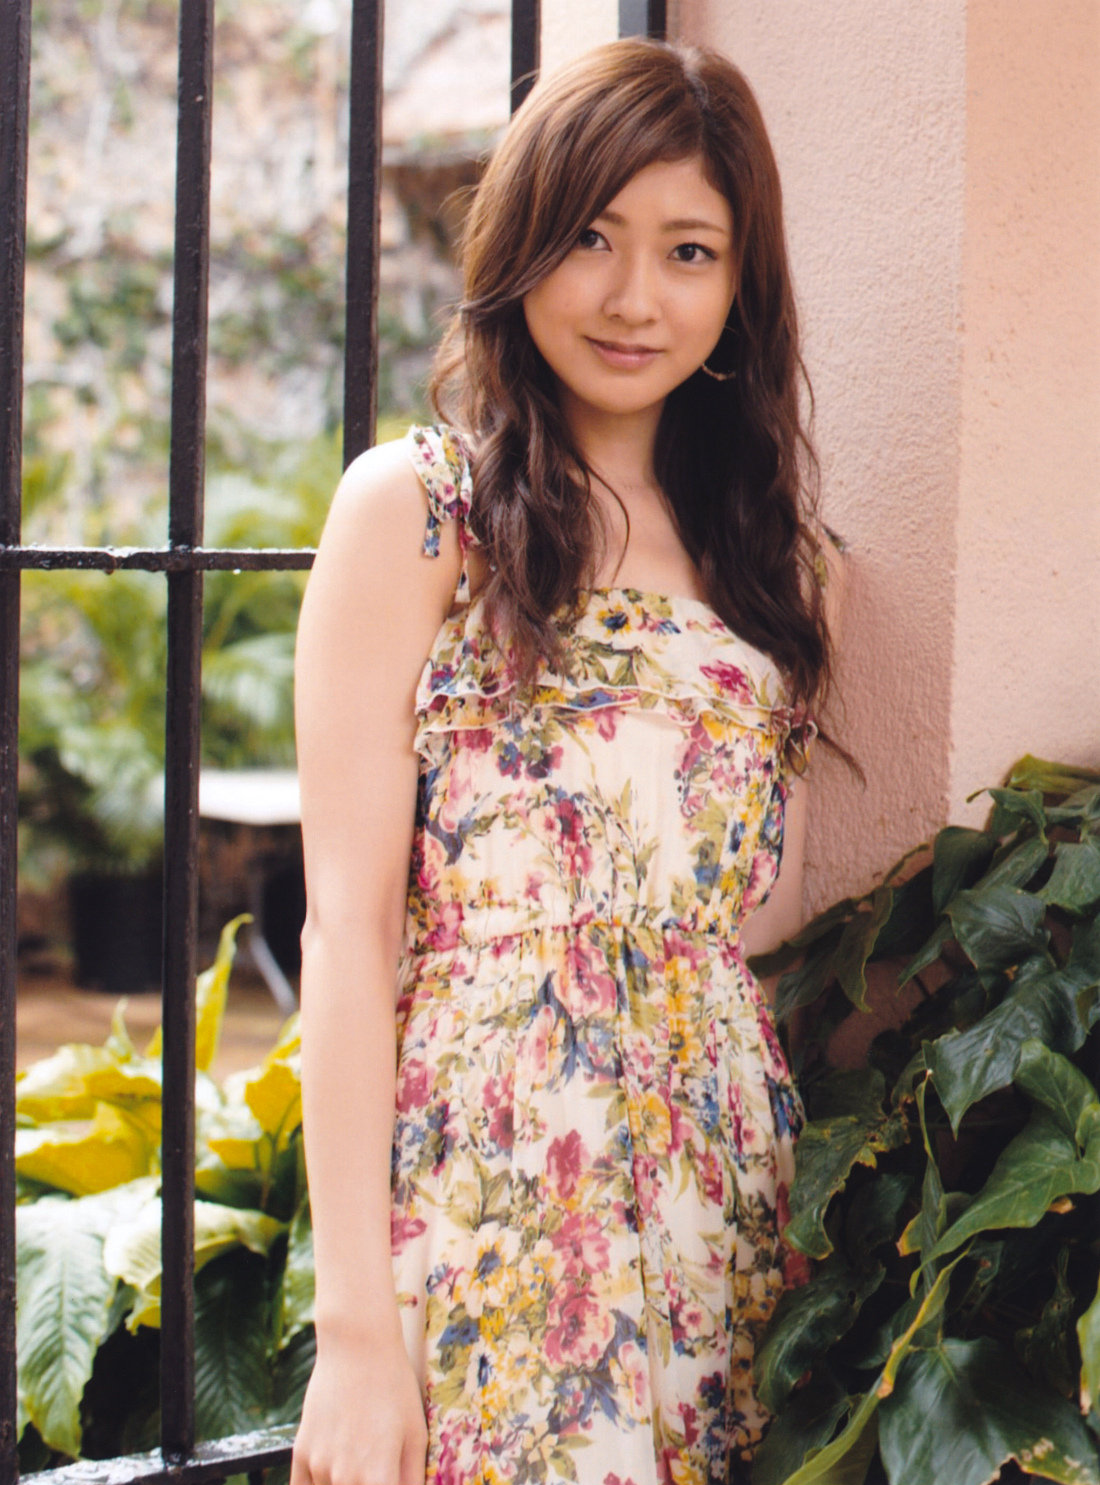 Nao Kanzaki and a few friends: Yurina Kumai: Few random ...  Nao Kanzaki and...